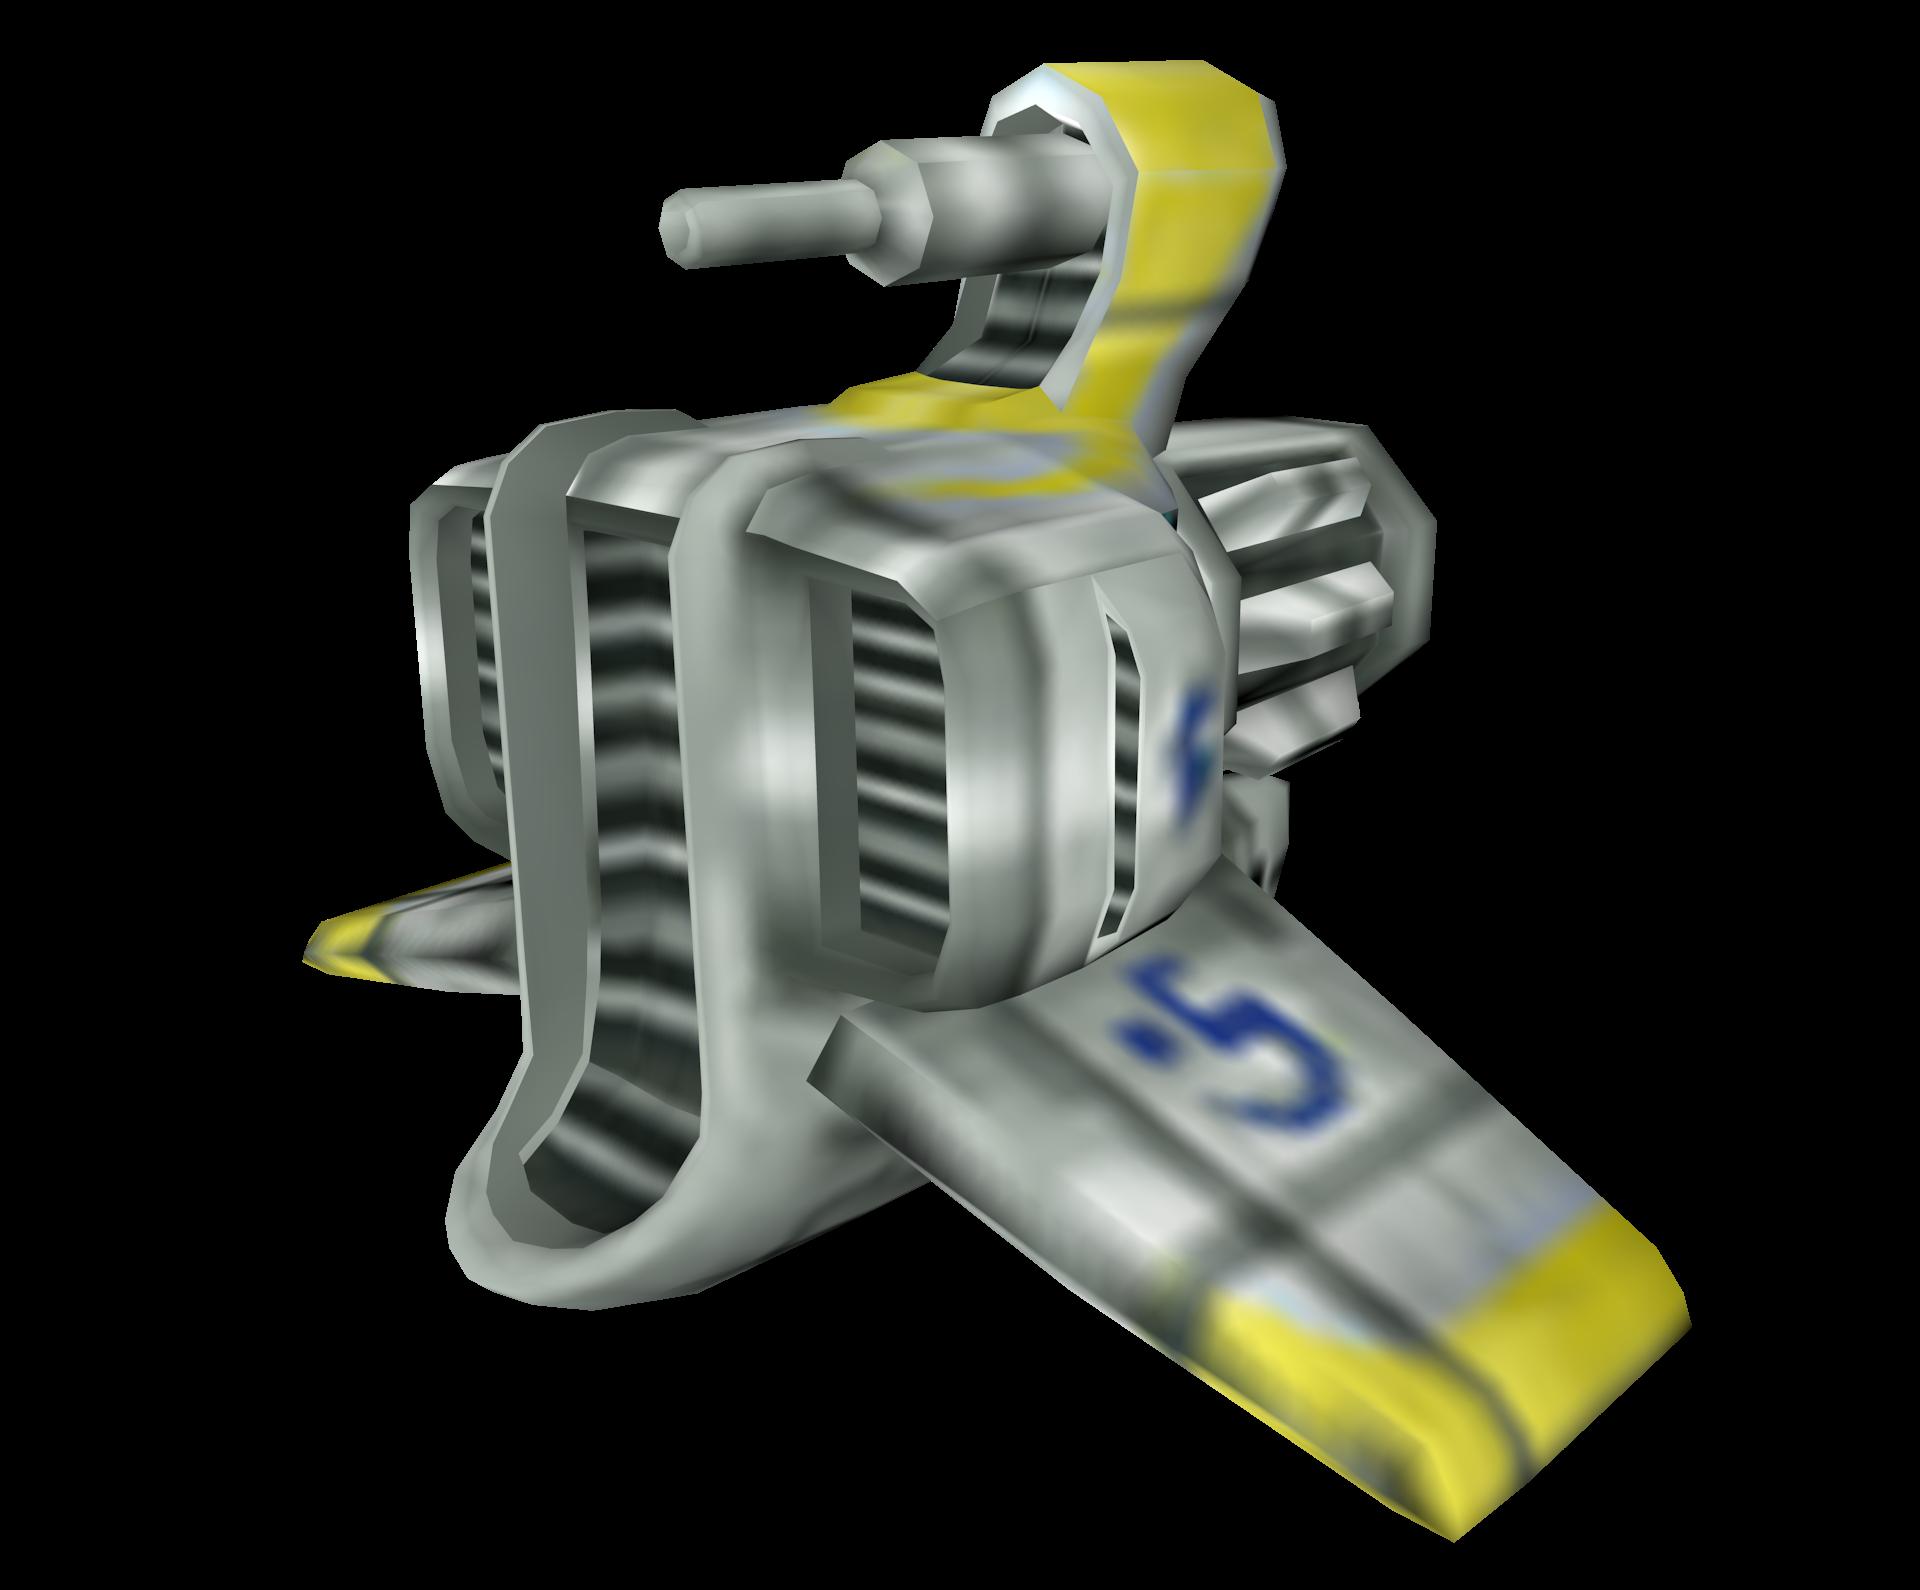 Aeropan fighter